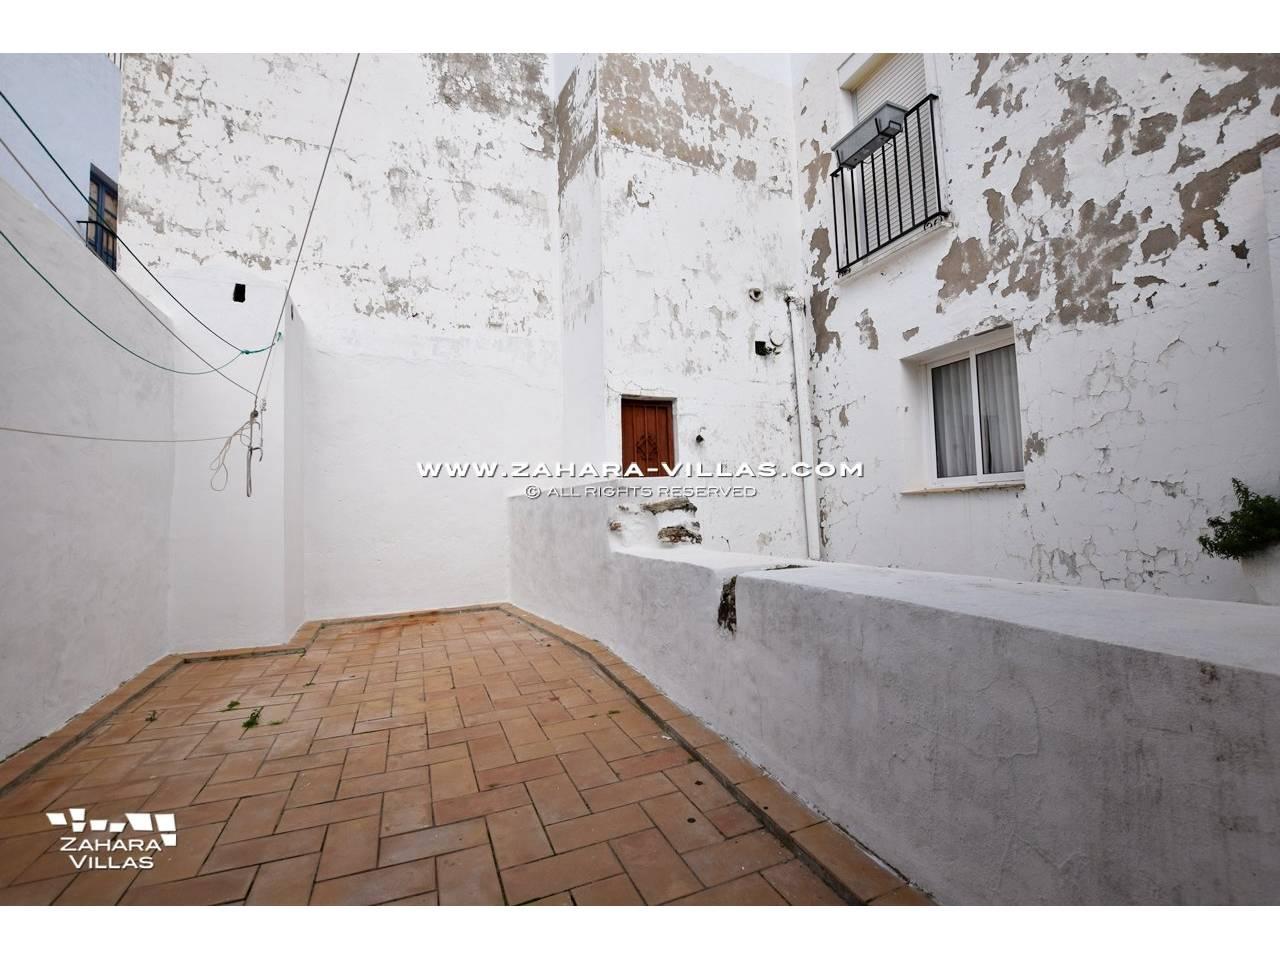 Imagen 9 de House, Apartment and Plot to build in the historic center of Vejer de la Frontera